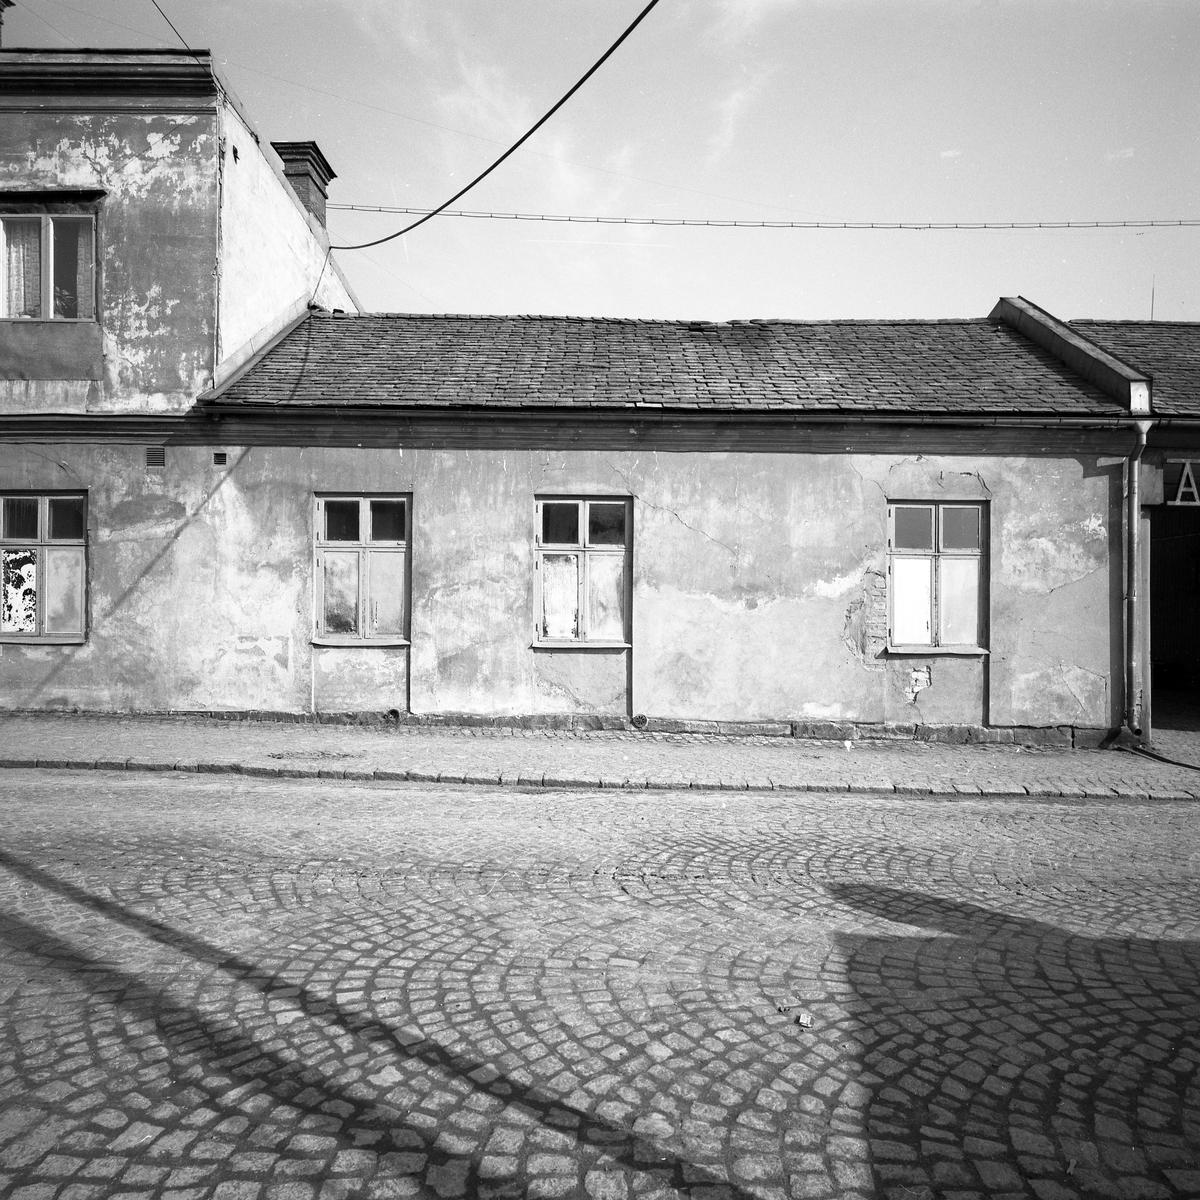 Dokumentation av kvarteret Bryggaren i Arvika som det såg ut i april 1959.